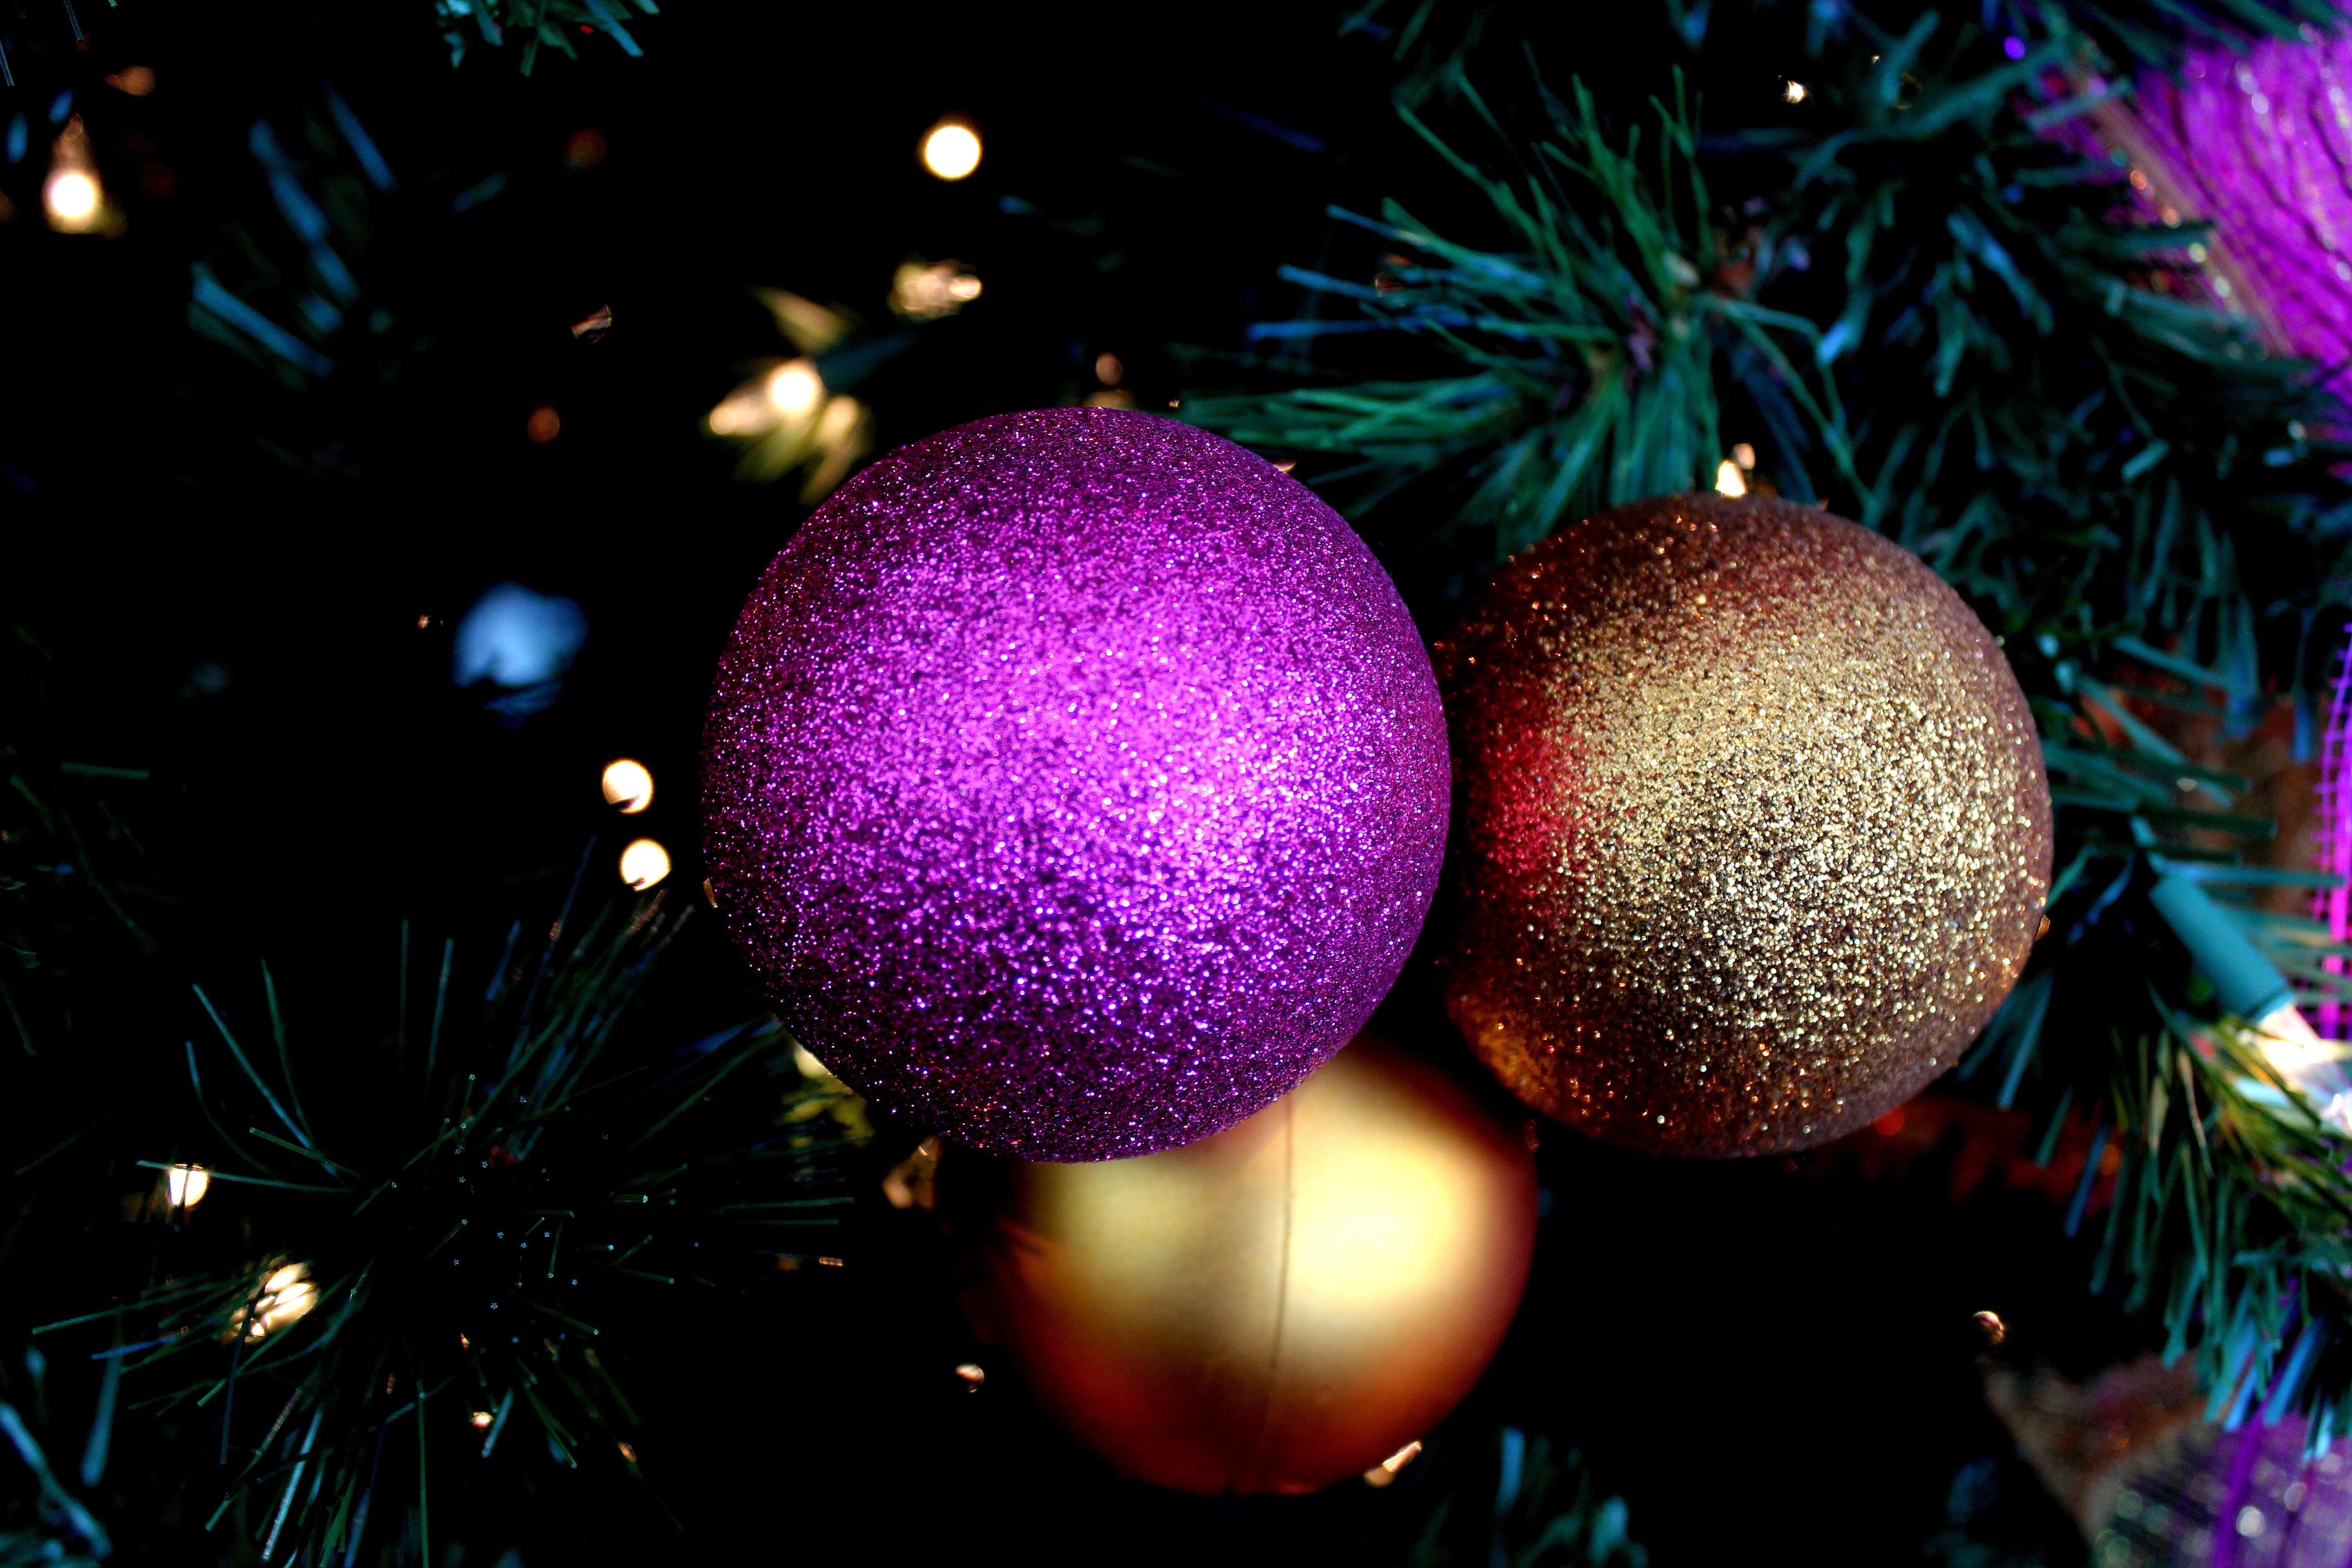 fotos gratis rama interior celebracion fiesta brillo rbol de navidad iluminado decoracin navidea art estacional bolas iluminacin alegre